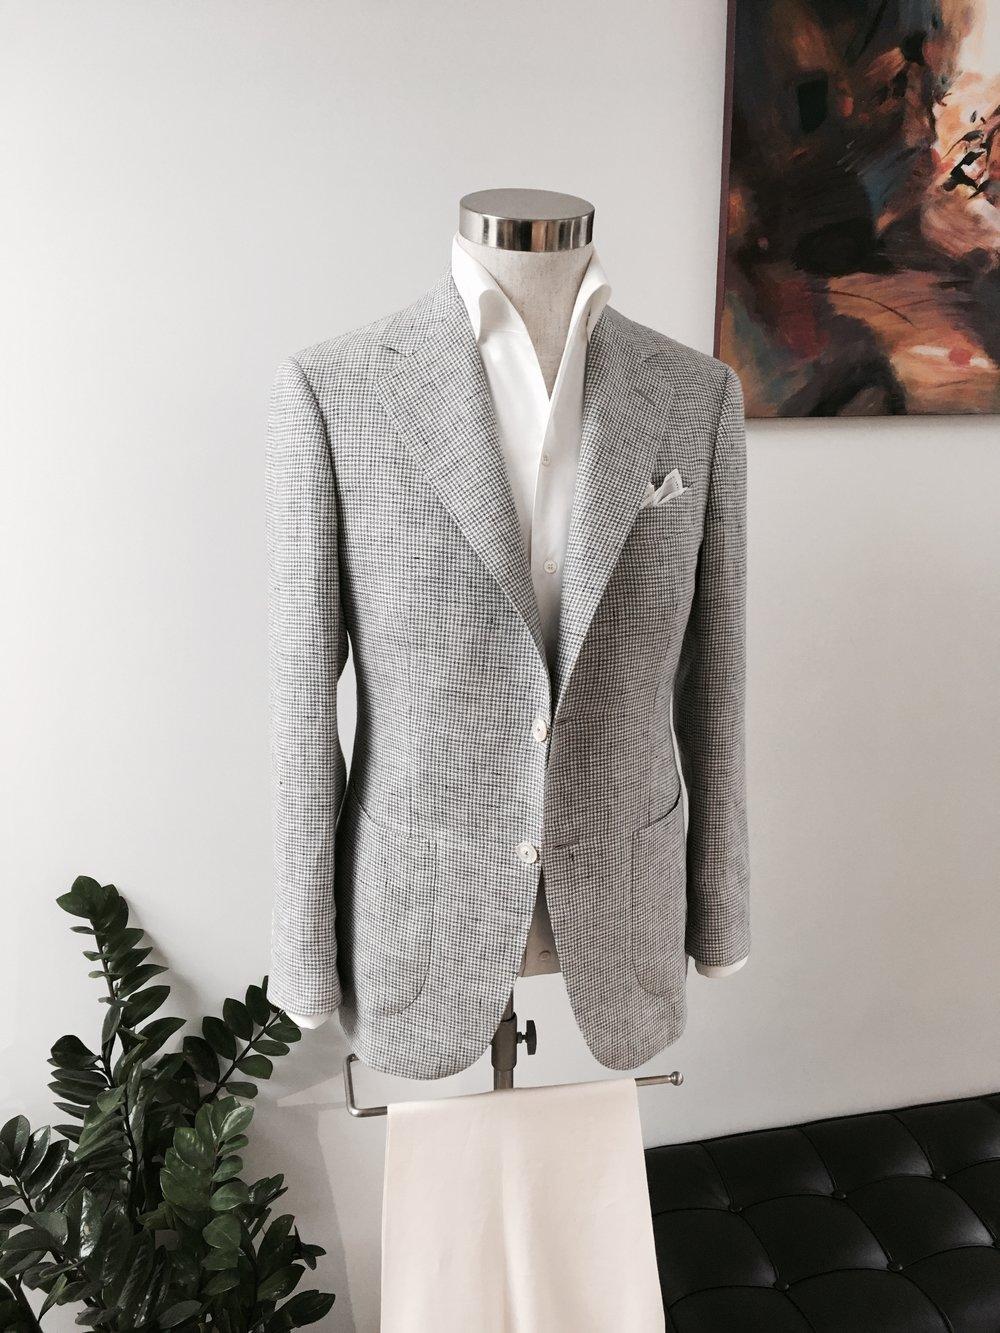 Summer Leisure Wear in Houndstooth Linen. From HK$13,800.